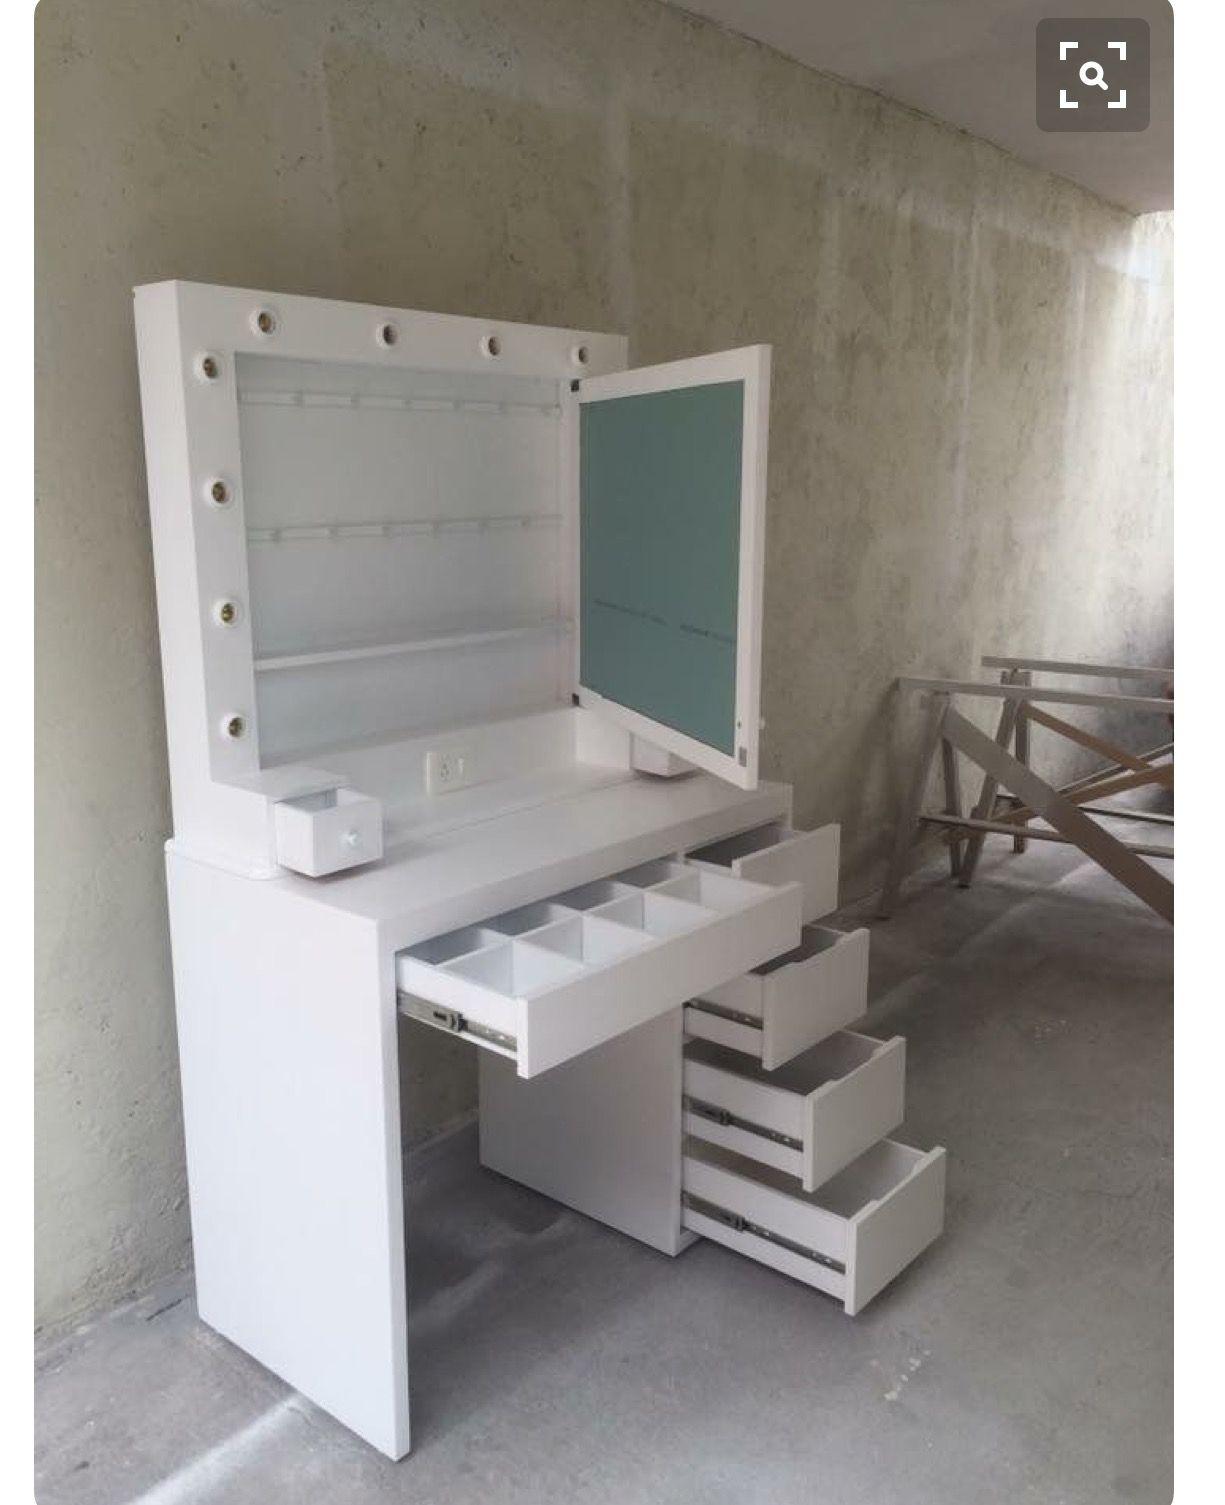 Small space storage galore vanity desk ideas pinterest